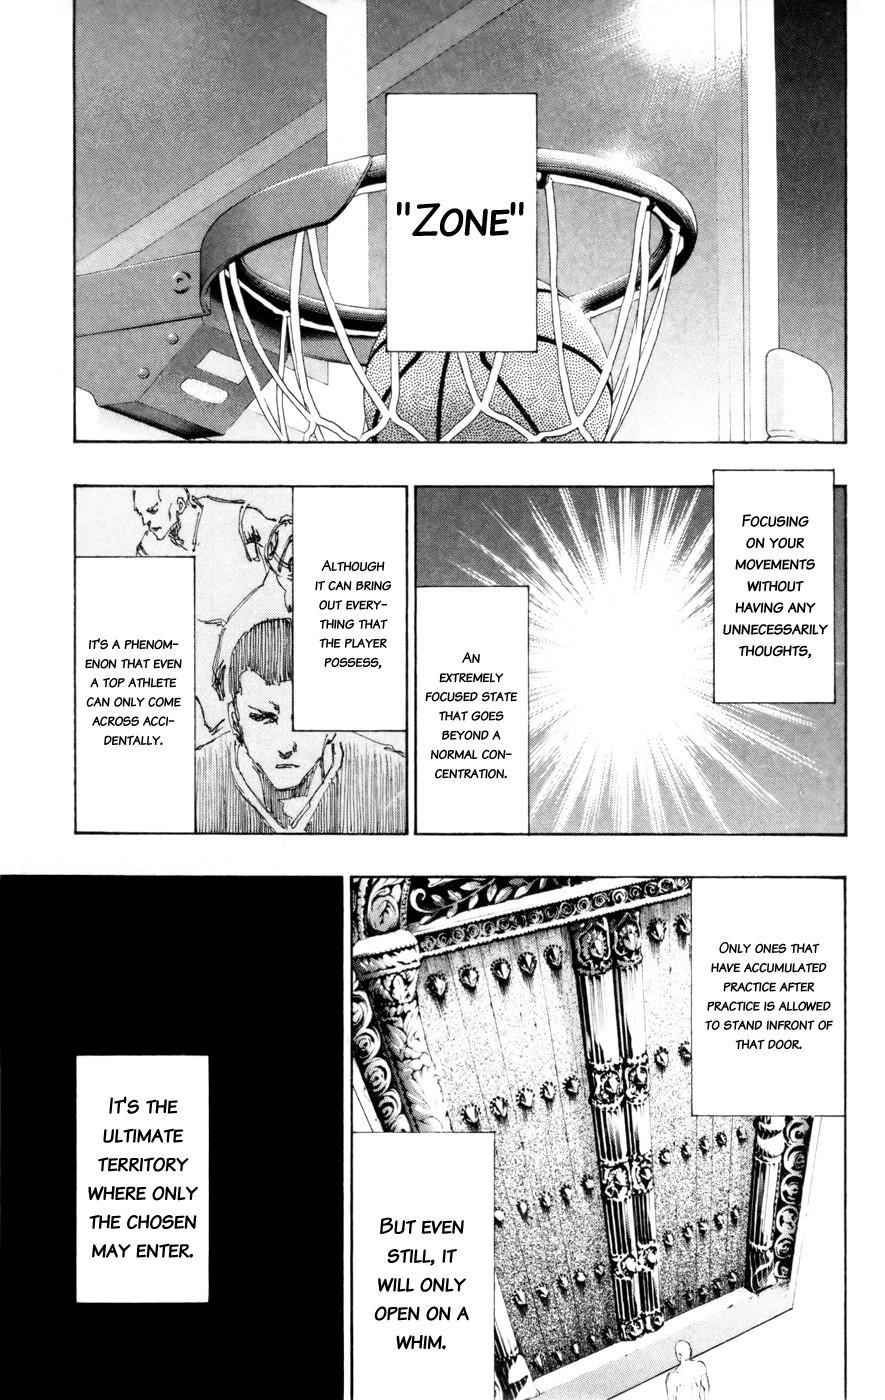 Kuroko no Basket Manga Chapter 133 - Image 13